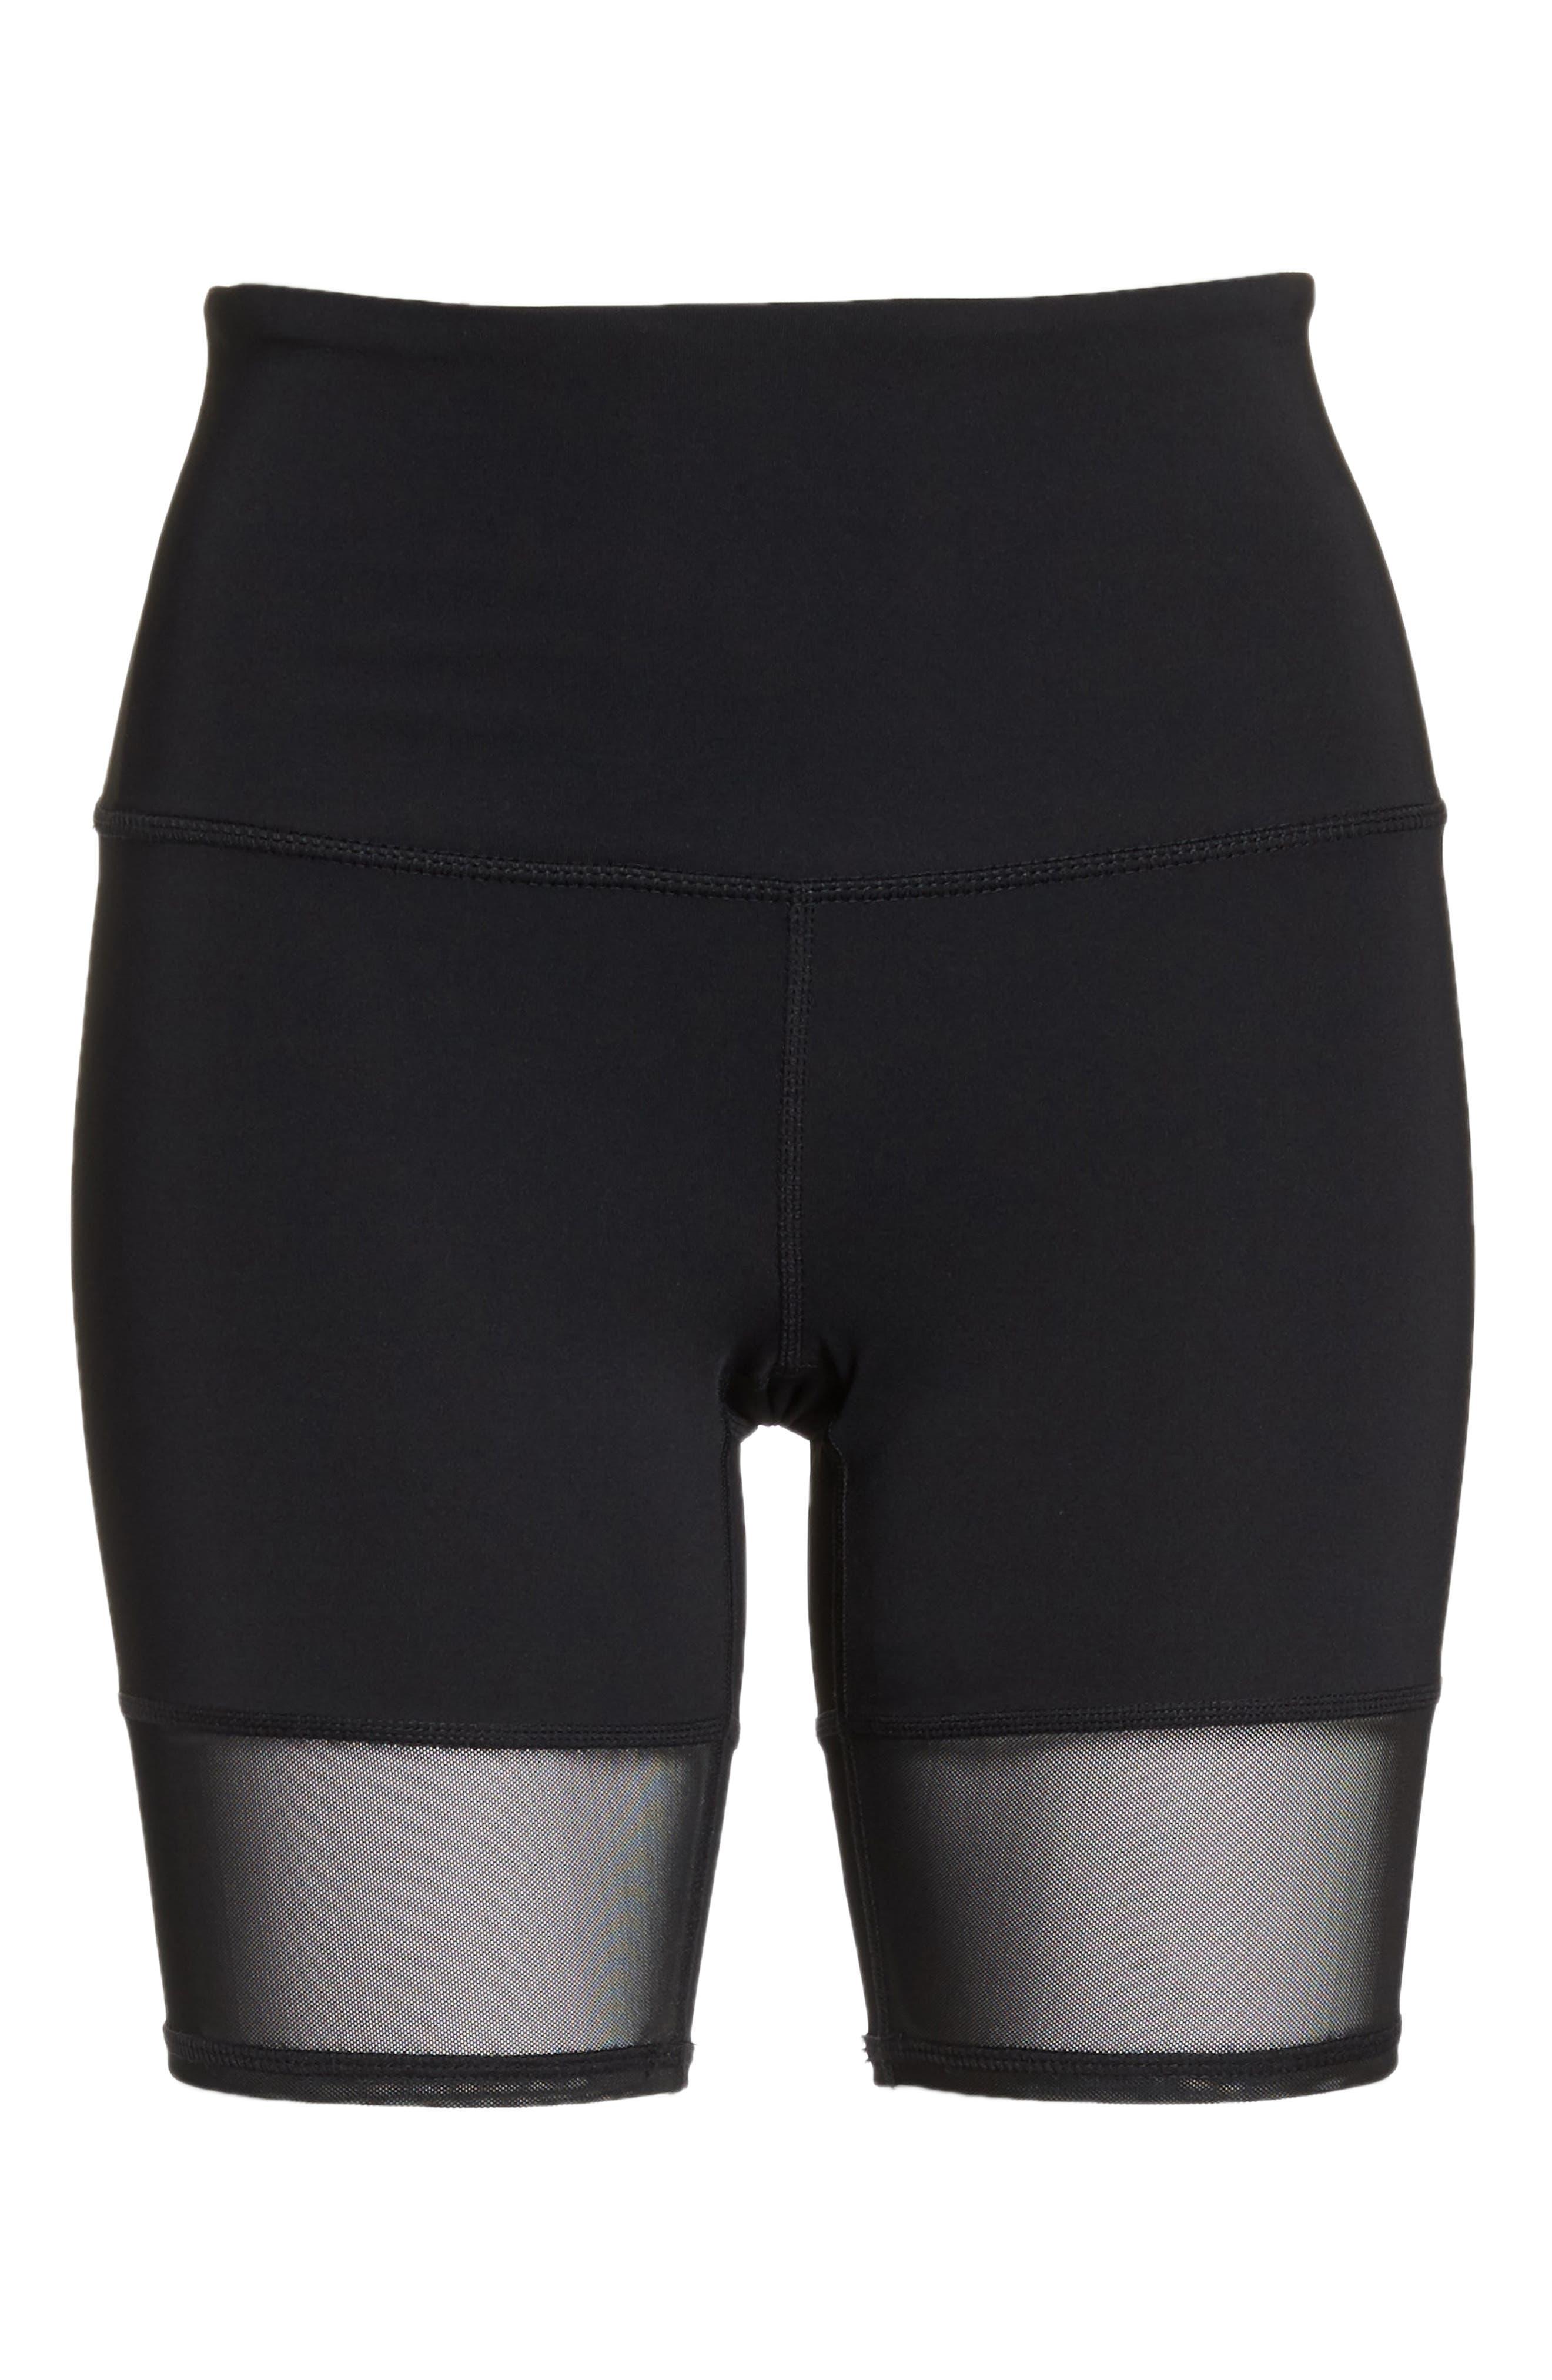 Mia Vision High Waist Mesh Bike Shorts,                             Alternate thumbnail 7, color,                             Black